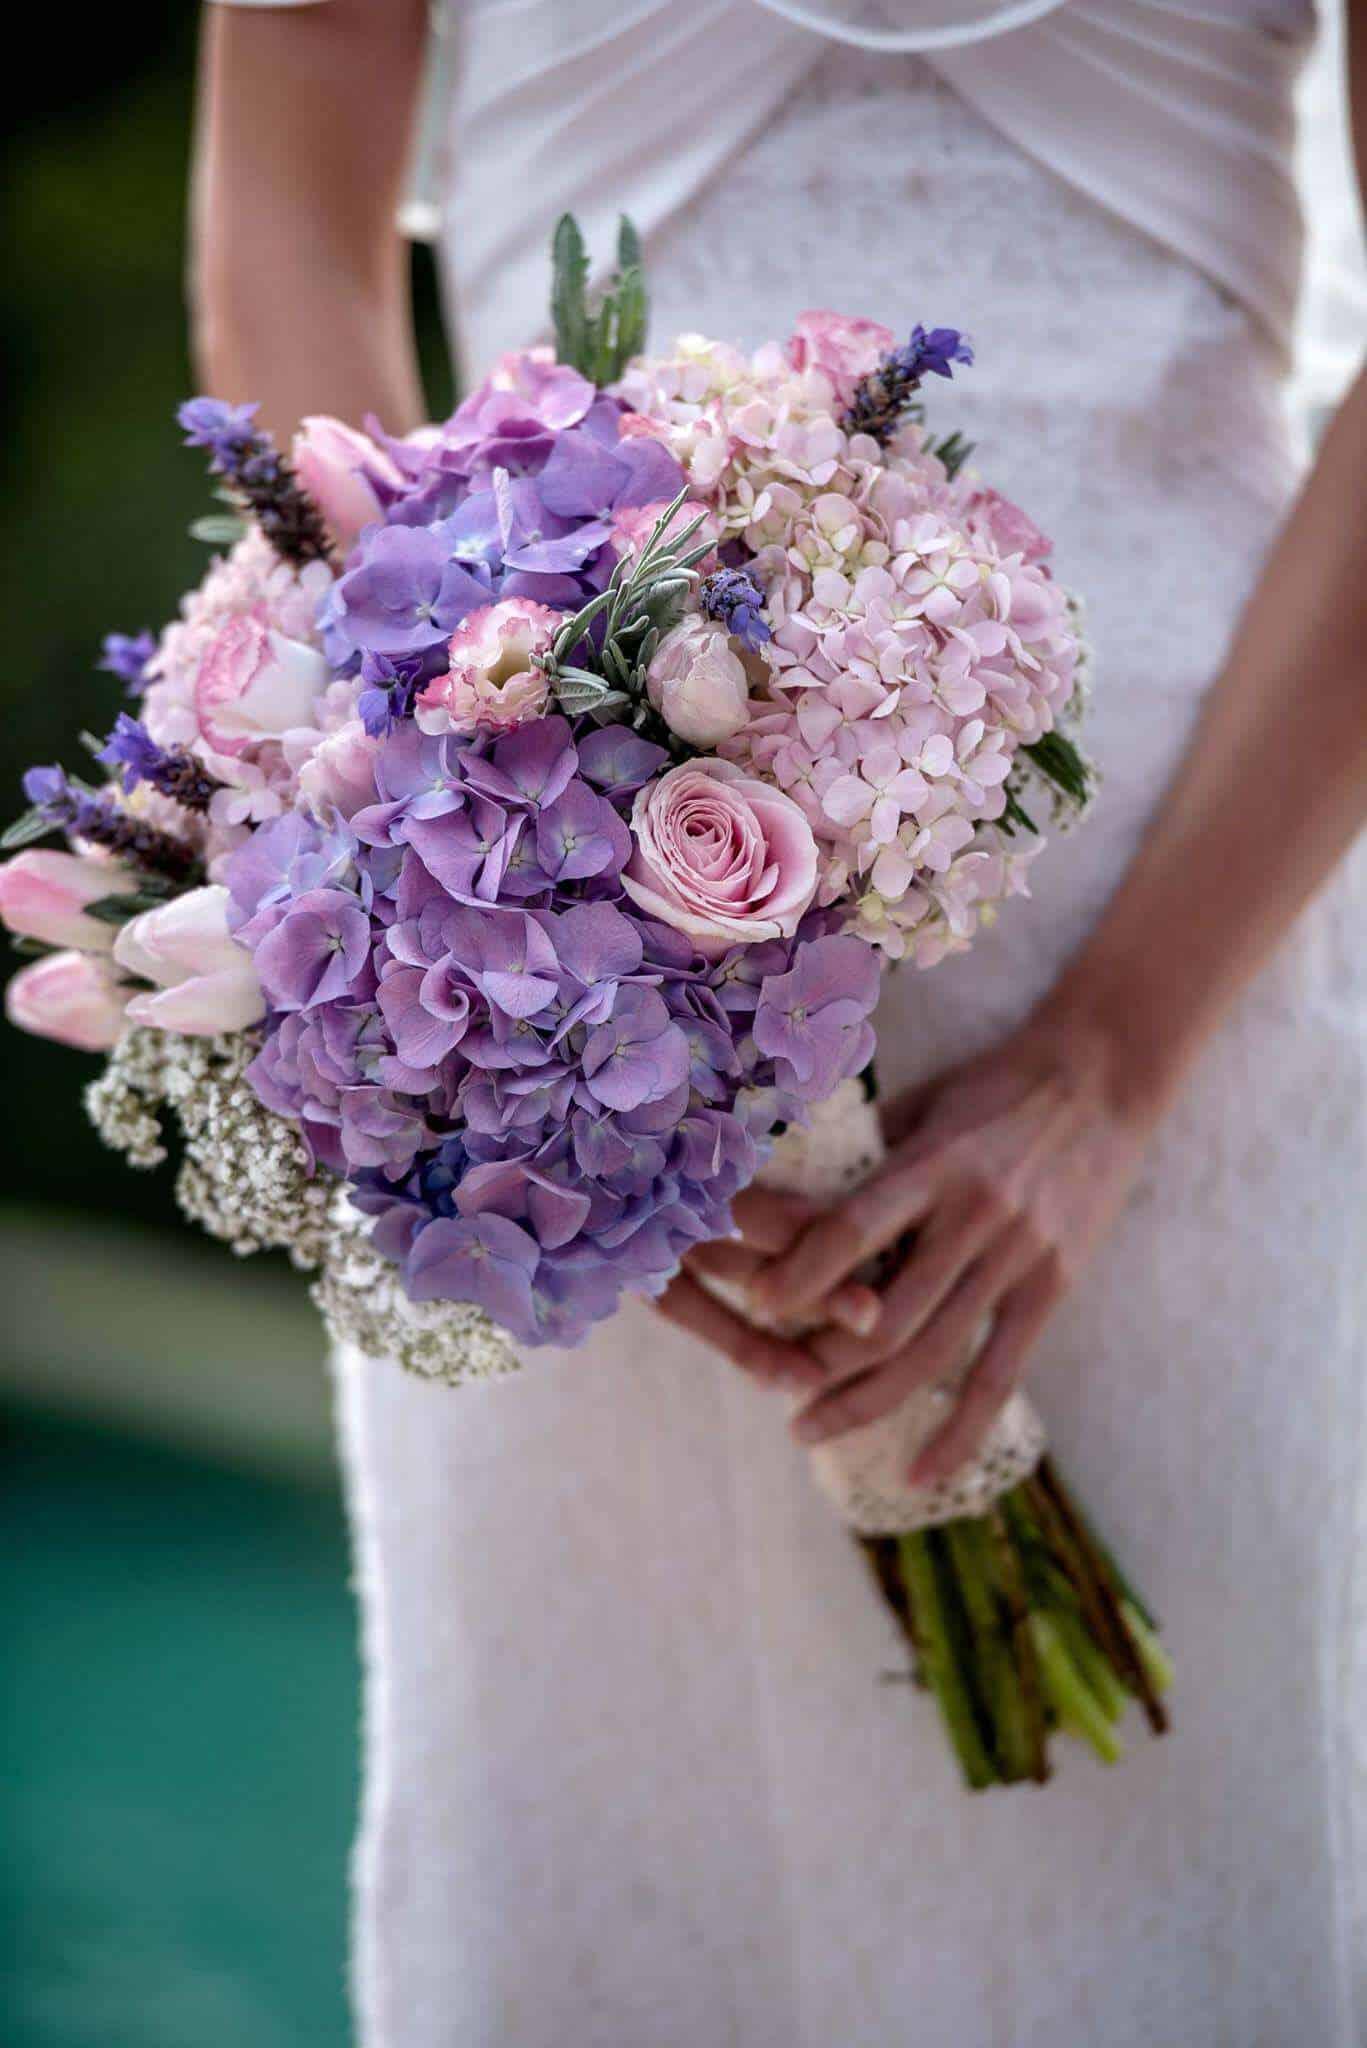 Bouquet Ceremony Flowers Phuket Thailand